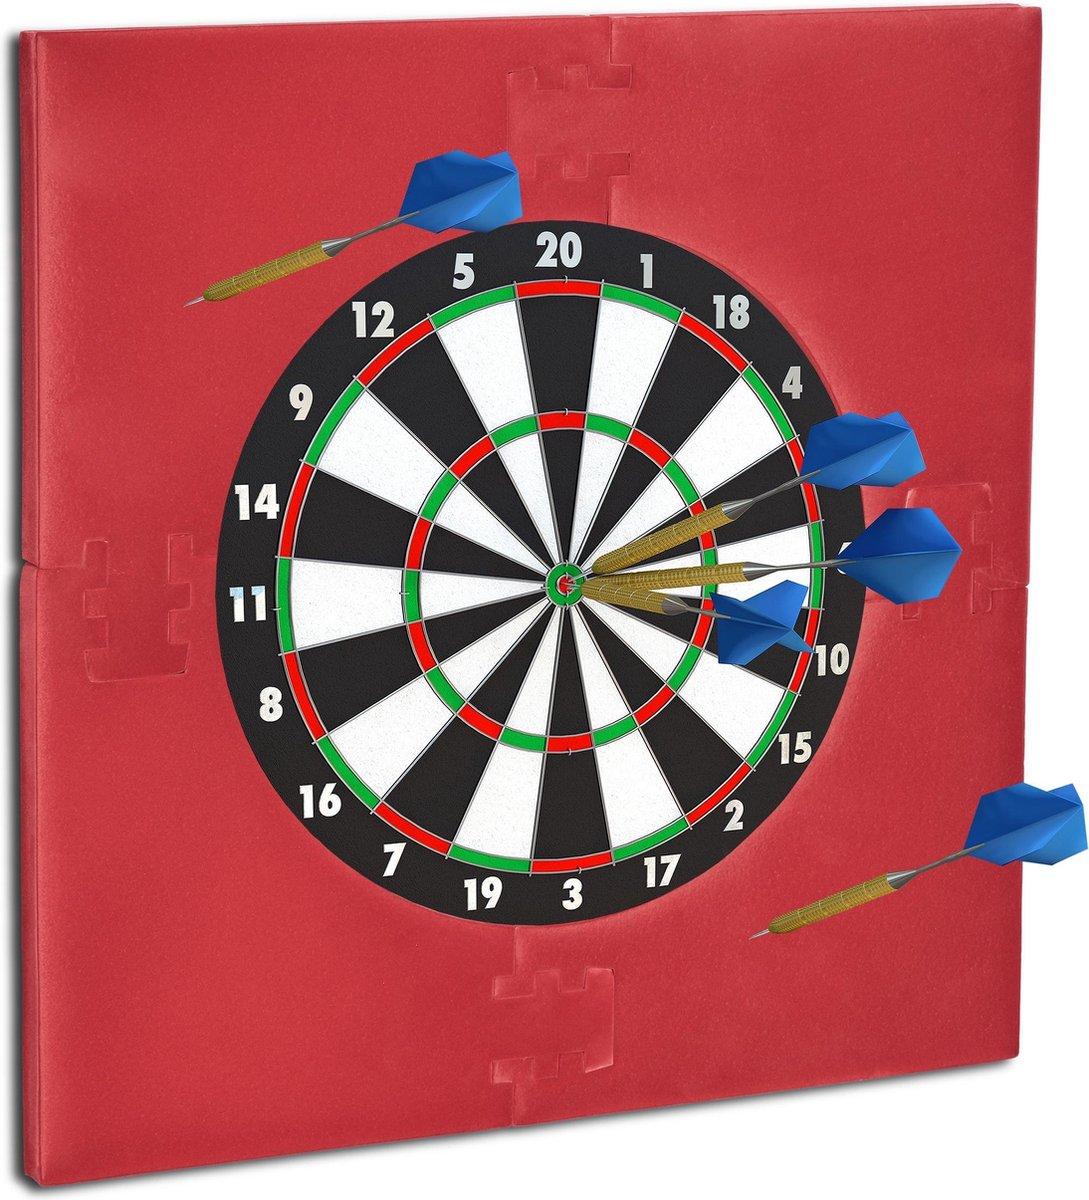 relaxdays dartbord surround ring - beschermrand - beschermring - ring voor dartbord - 45cm Bordeaux